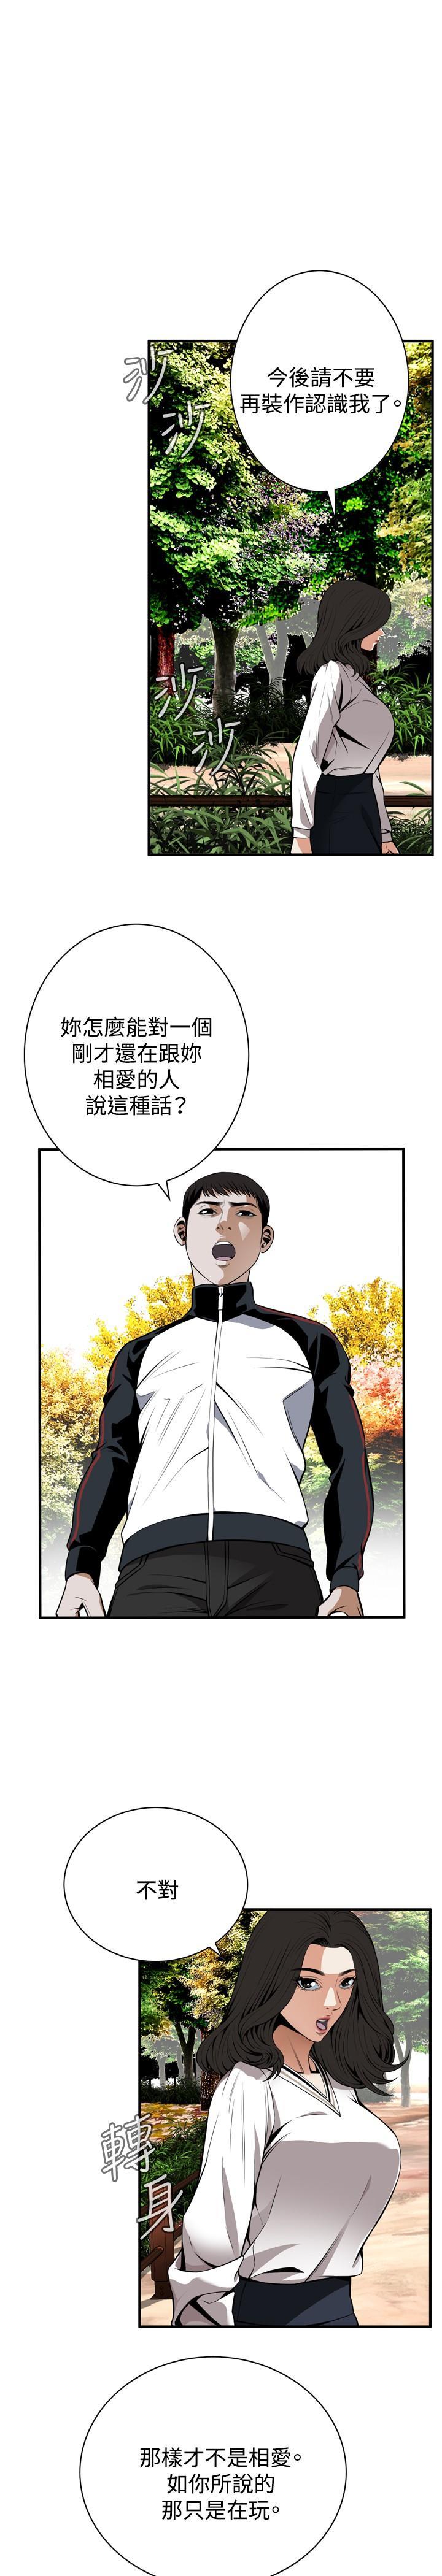 Take a Peek 偷窥 Ch.39~55 [Chinese]中文 96